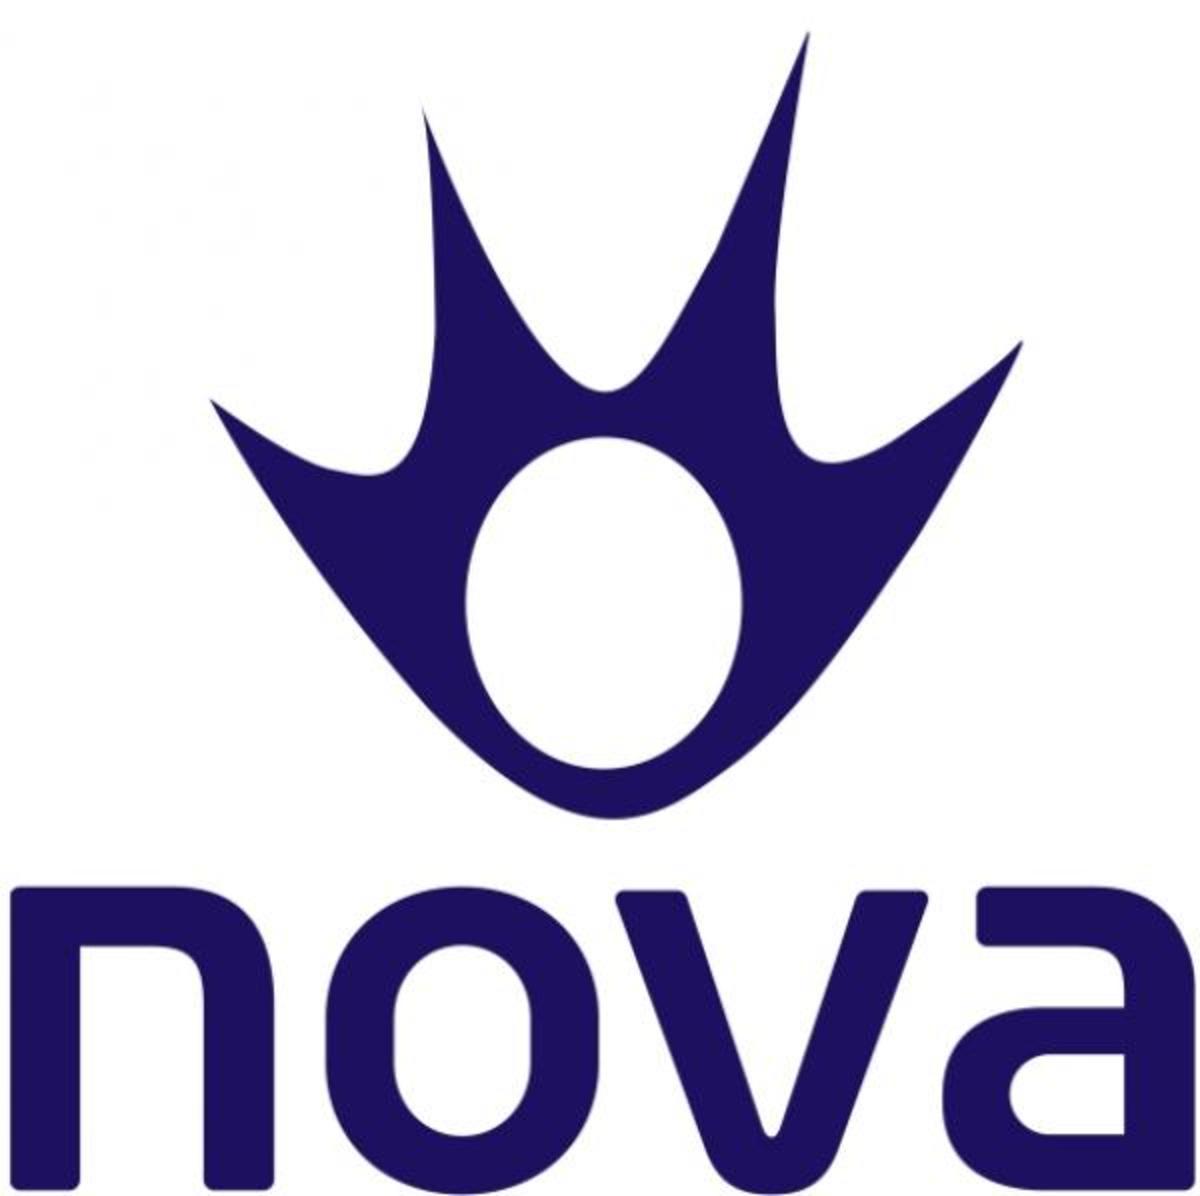 Aνακοίνωσε Τσάμπιονς Λιγκ και Γιουρόπα Λιγκ η NOVA | Newsit.gr